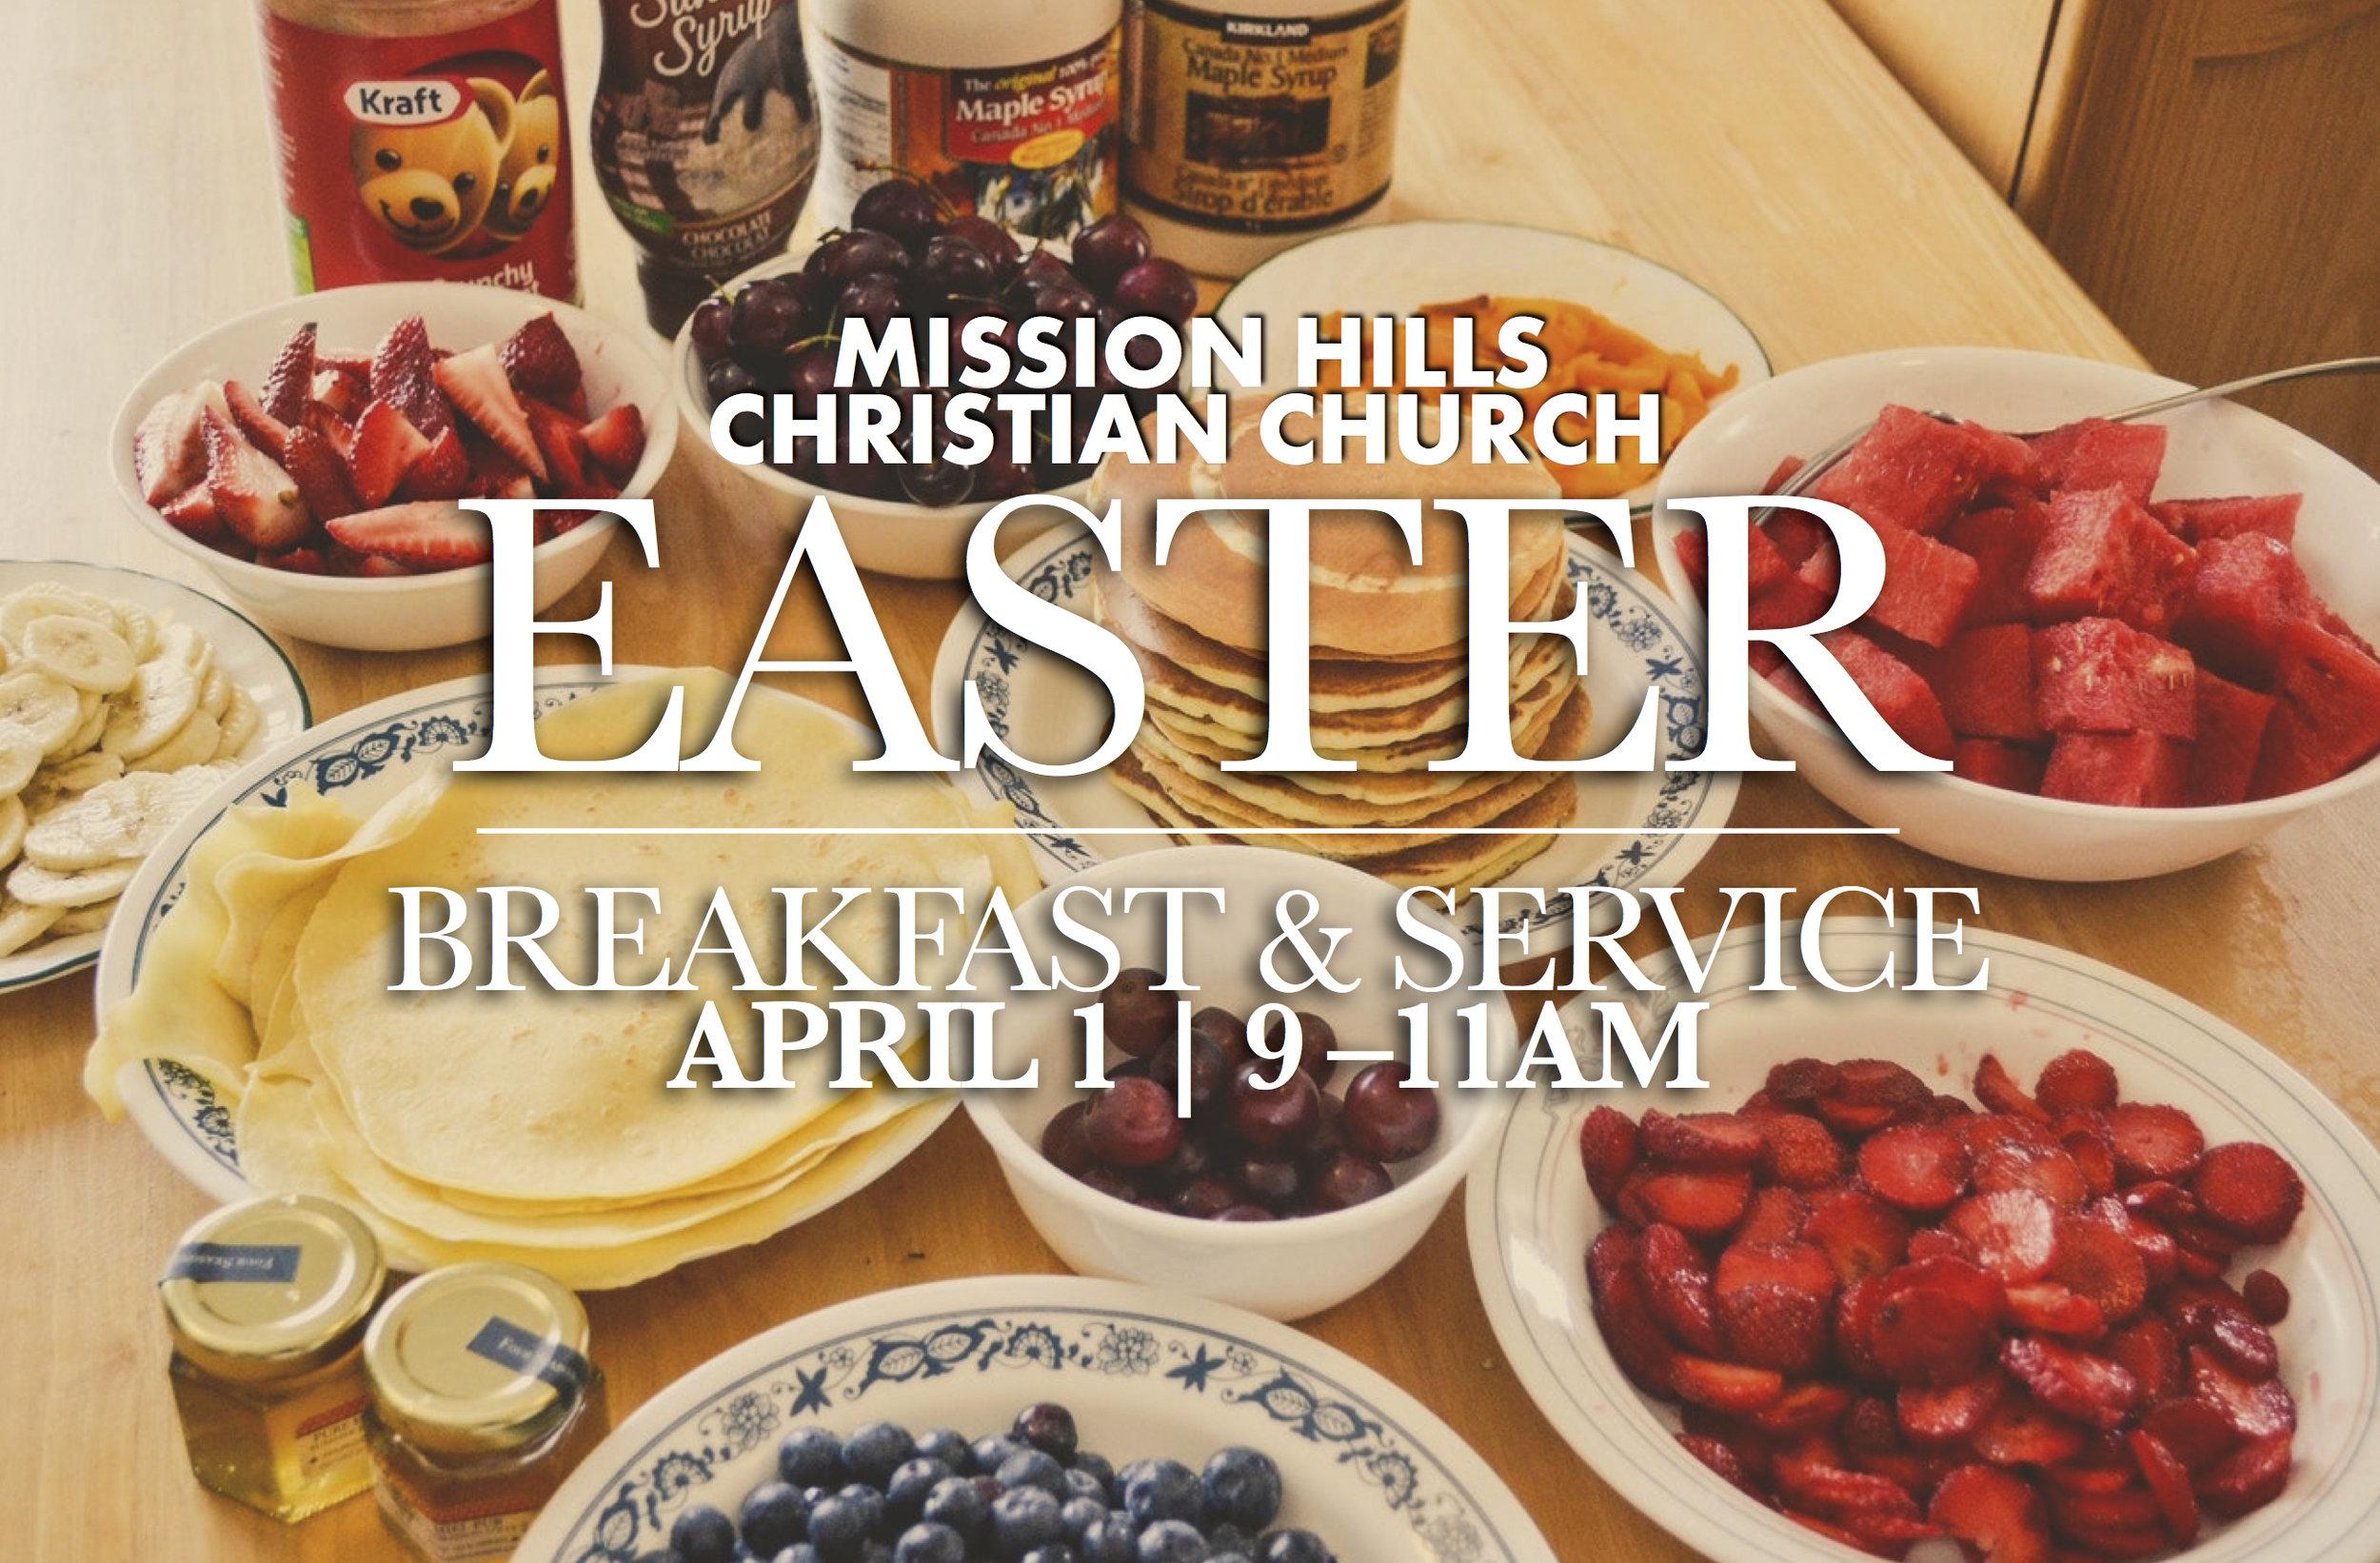 EASTER-POTLUCK-BREAKFAST-MISSION-HILLS-CHRISTIAN-CHURCH.jpg